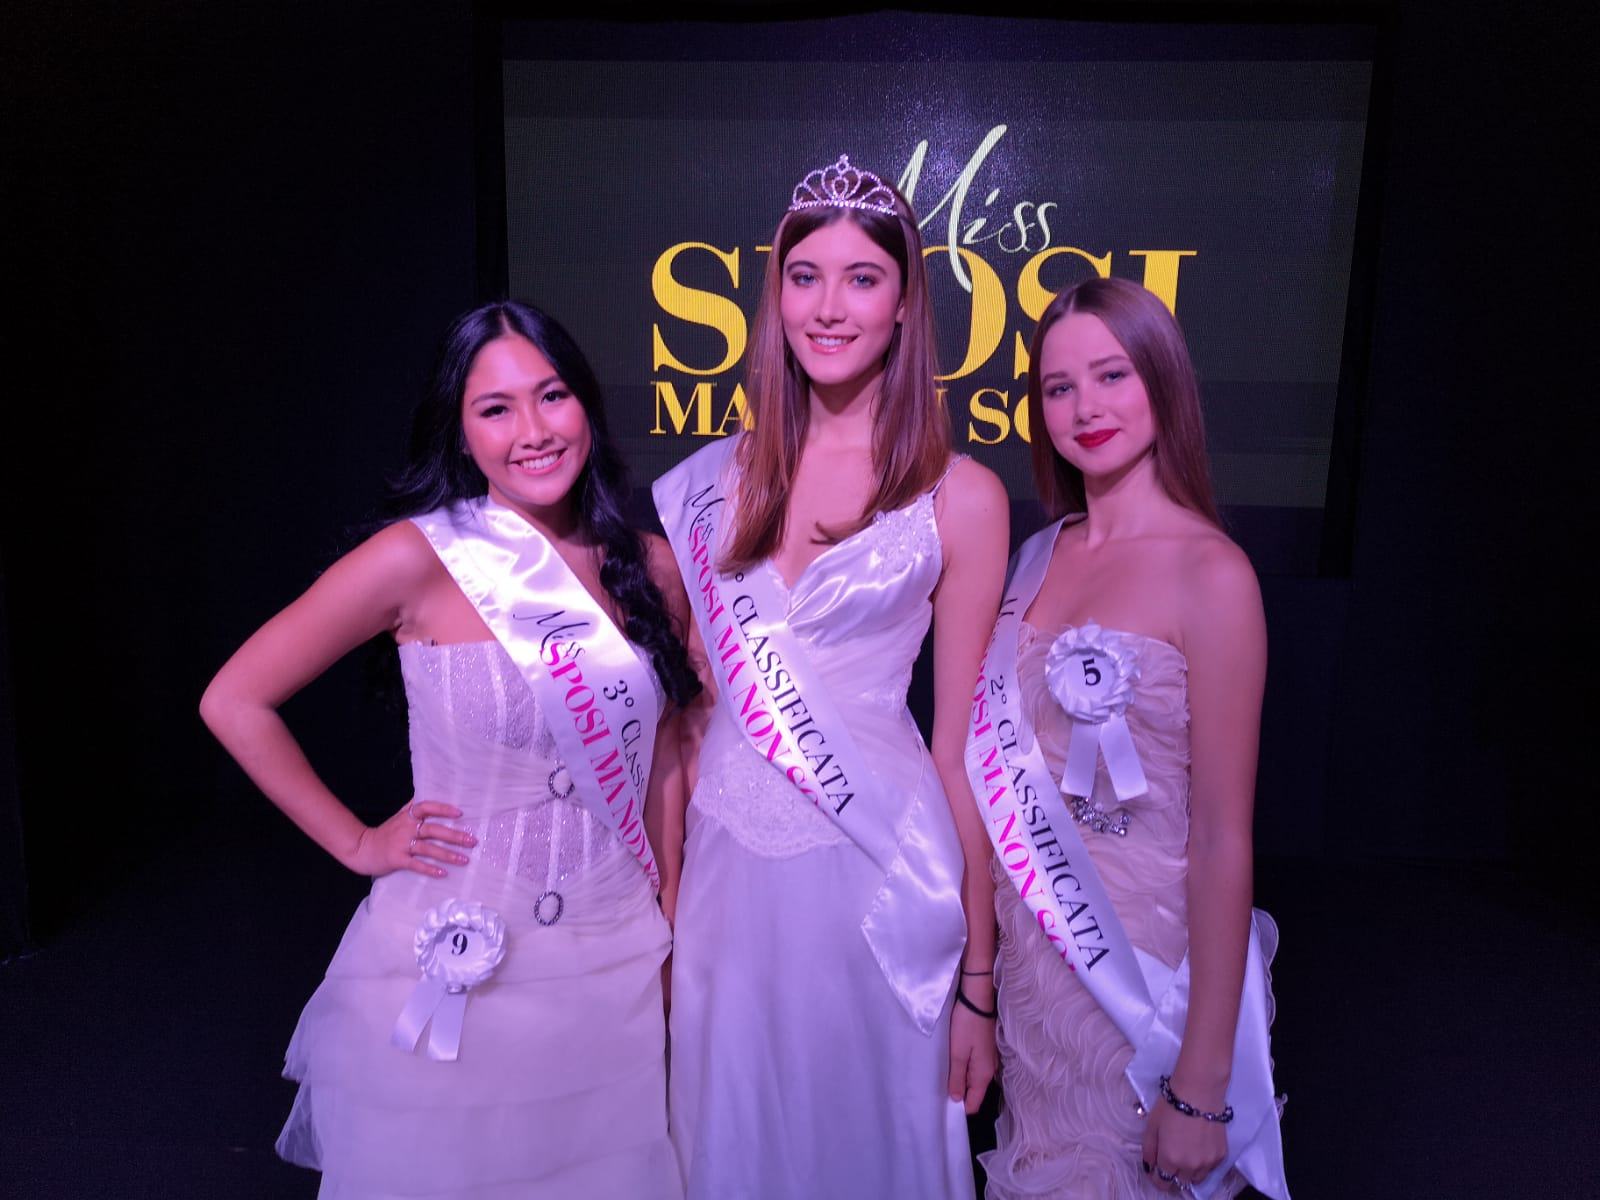 miss sposimanonsolo 2018